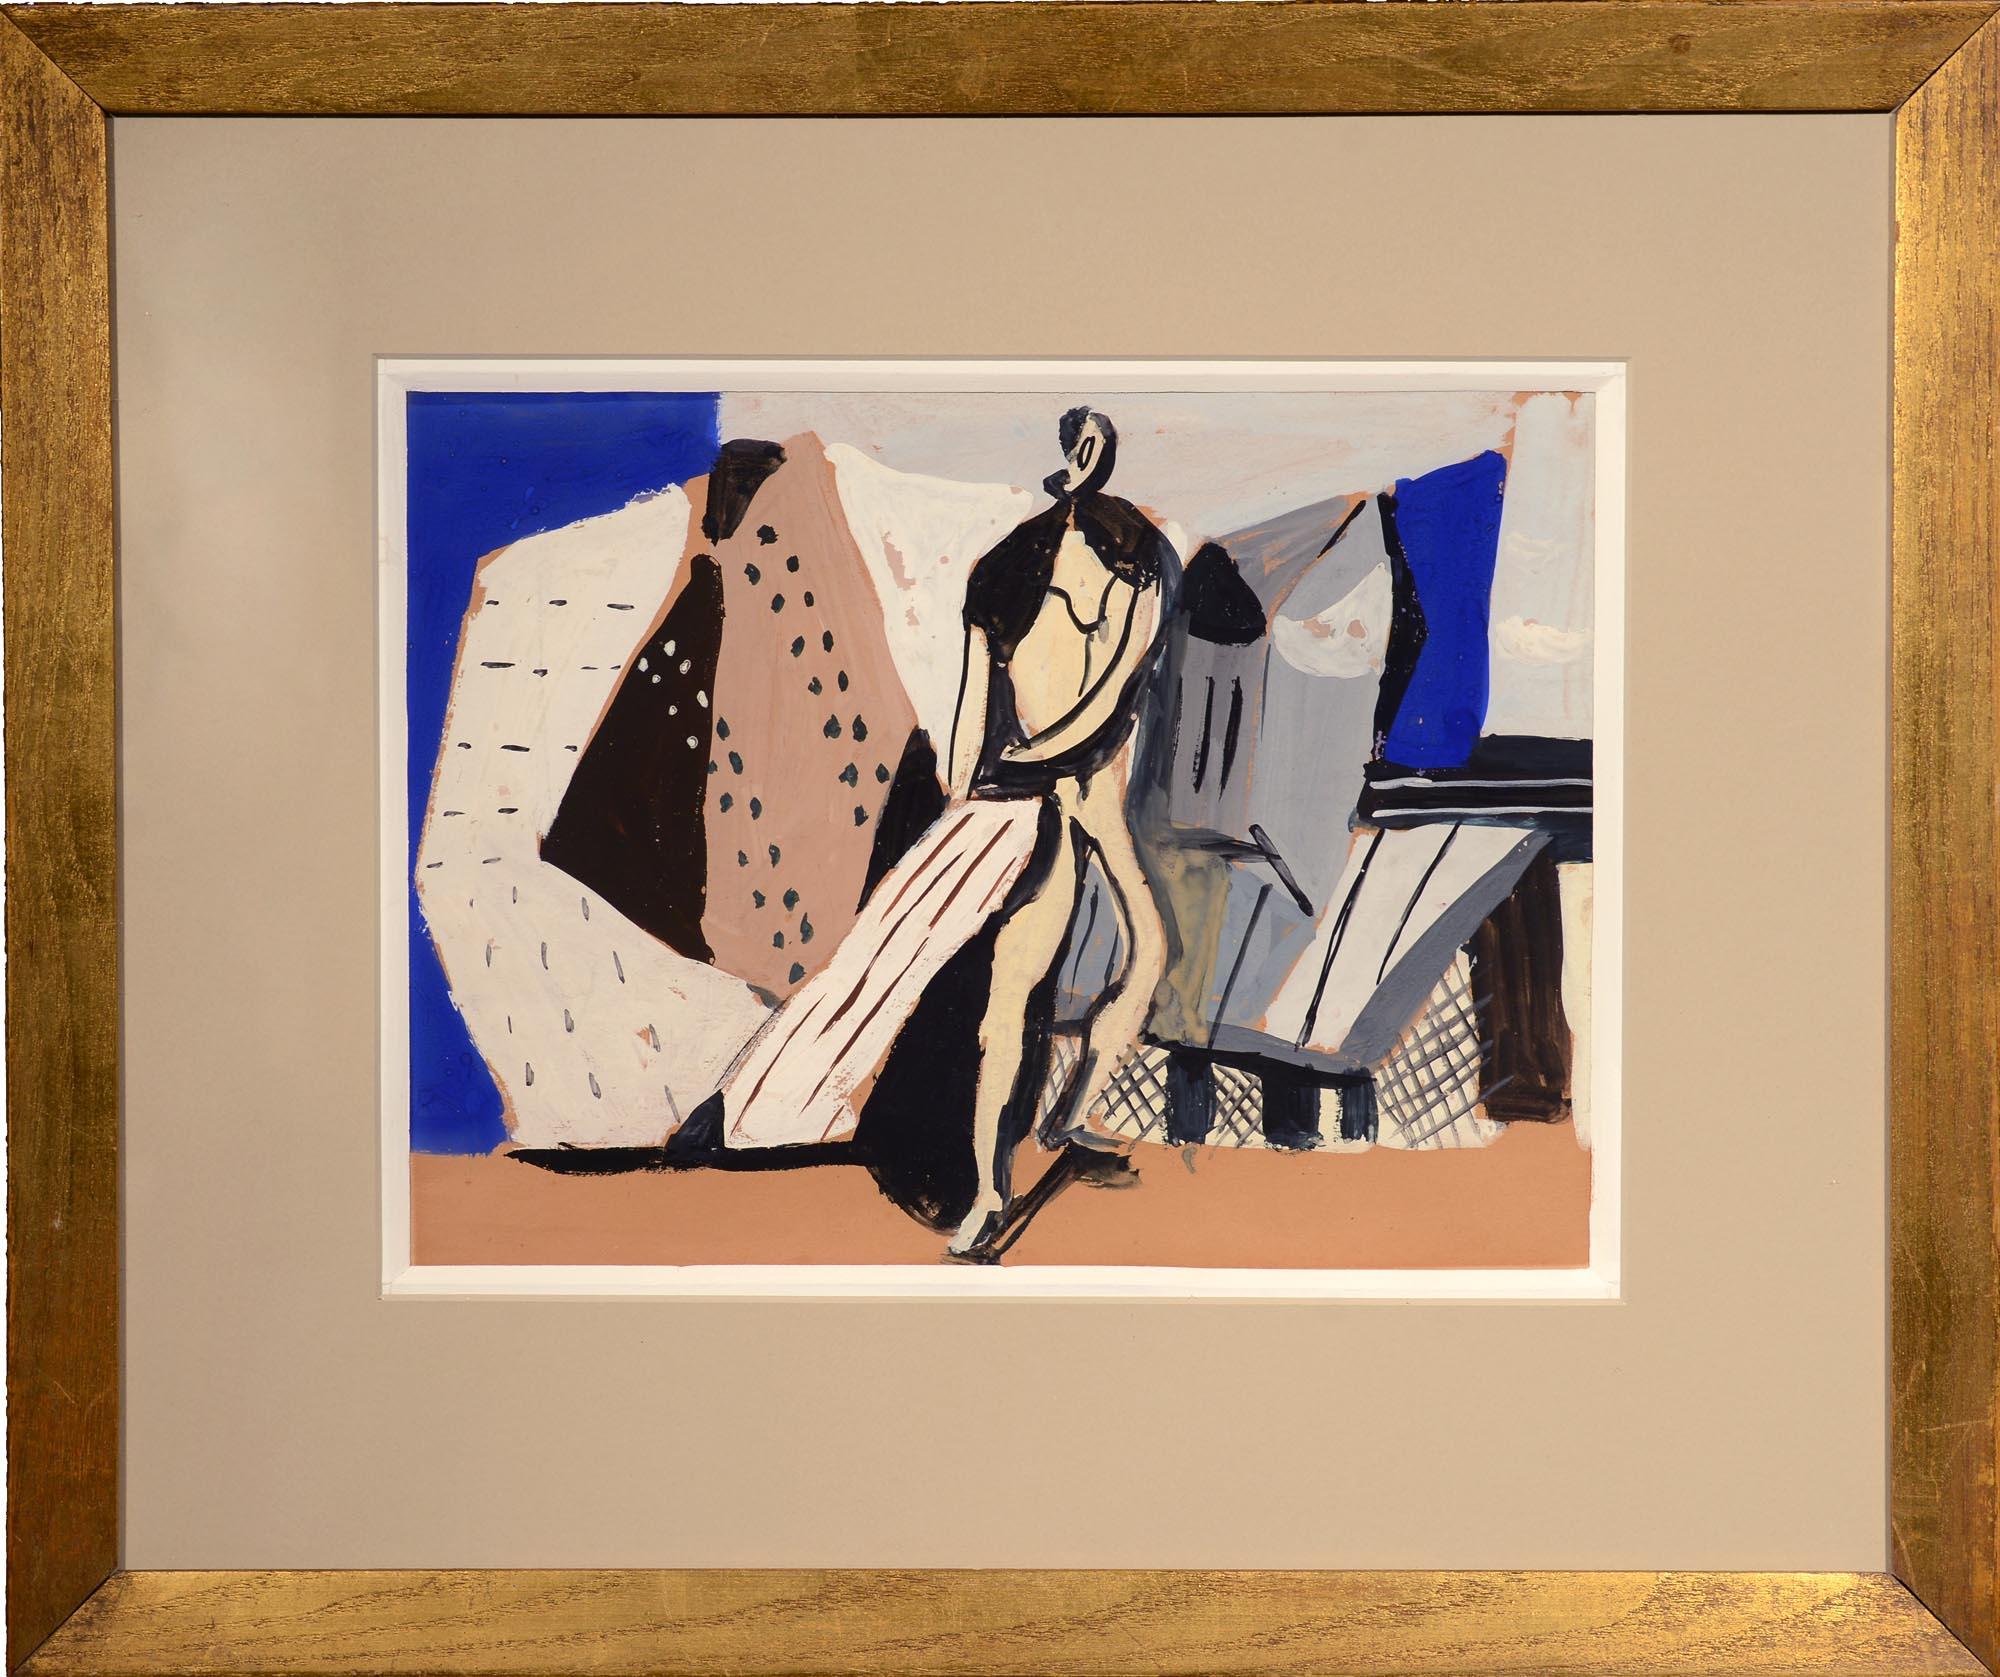 Vaclav Vytlacil Bather at the Lido framed